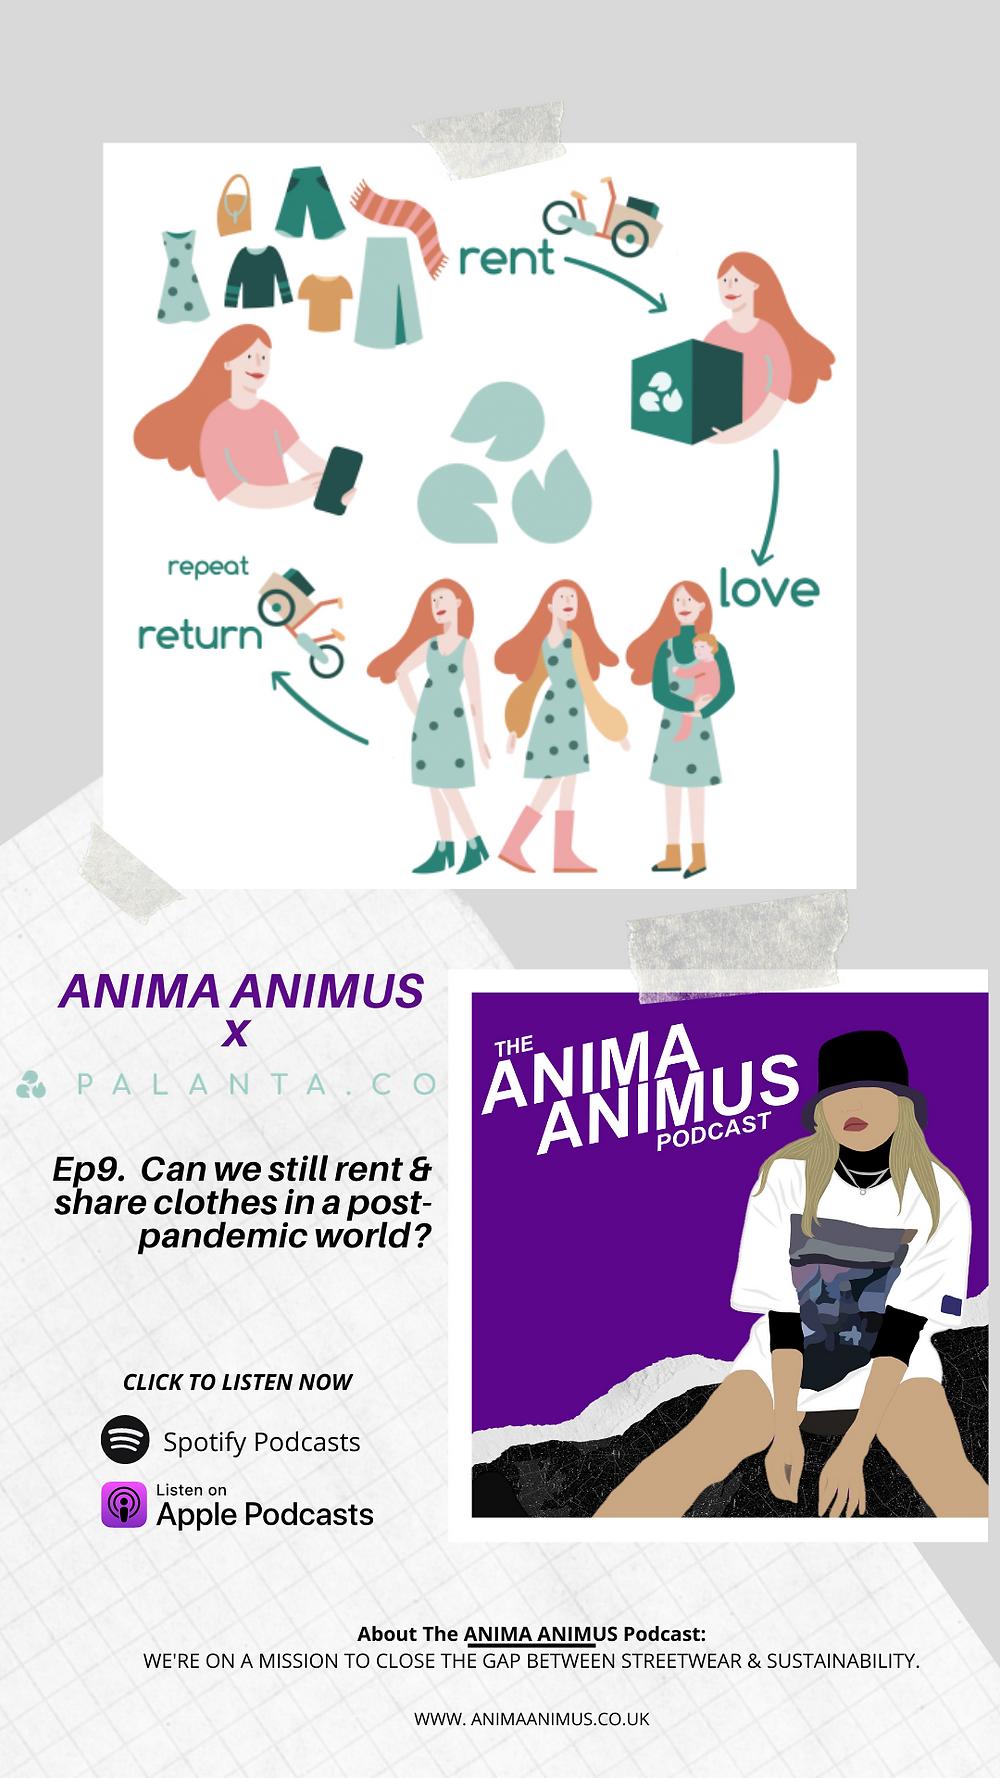 The ANIMA ANIMUS Podcast: a fashion sustainability podcast.